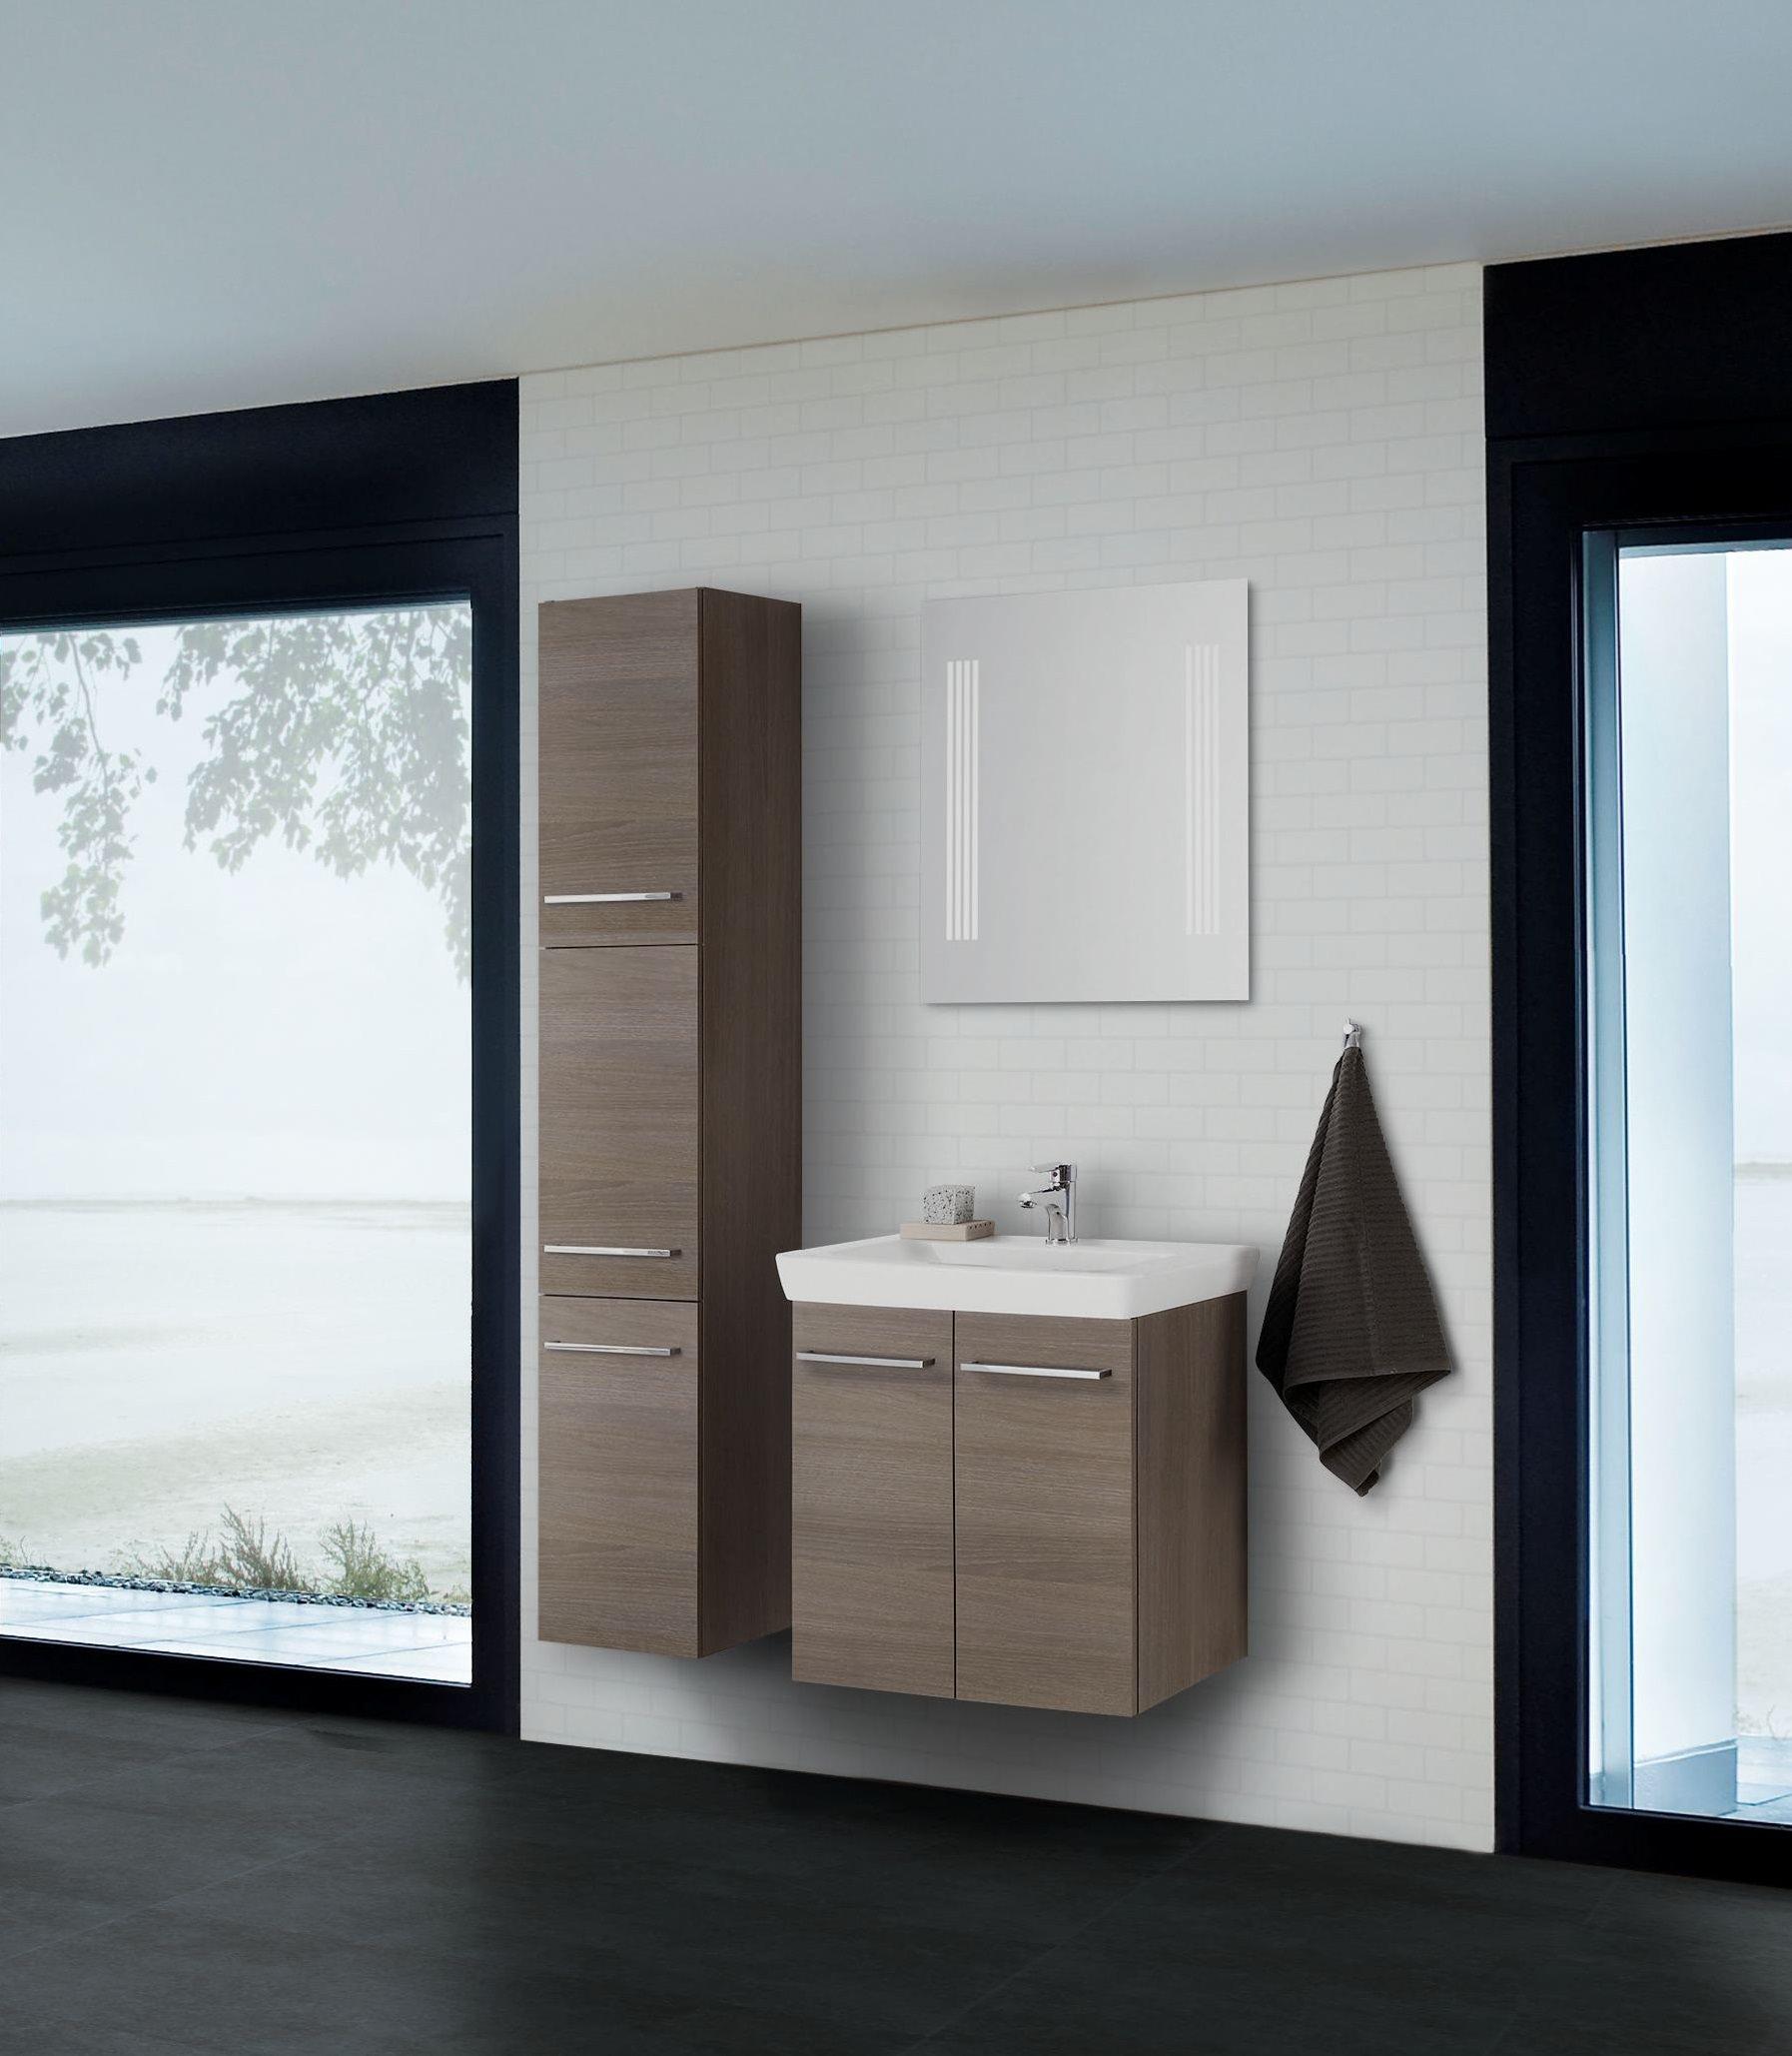 scanbad multo lotto komplett set 65cm mit spiegel grau. Black Bedroom Furniture Sets. Home Design Ideas